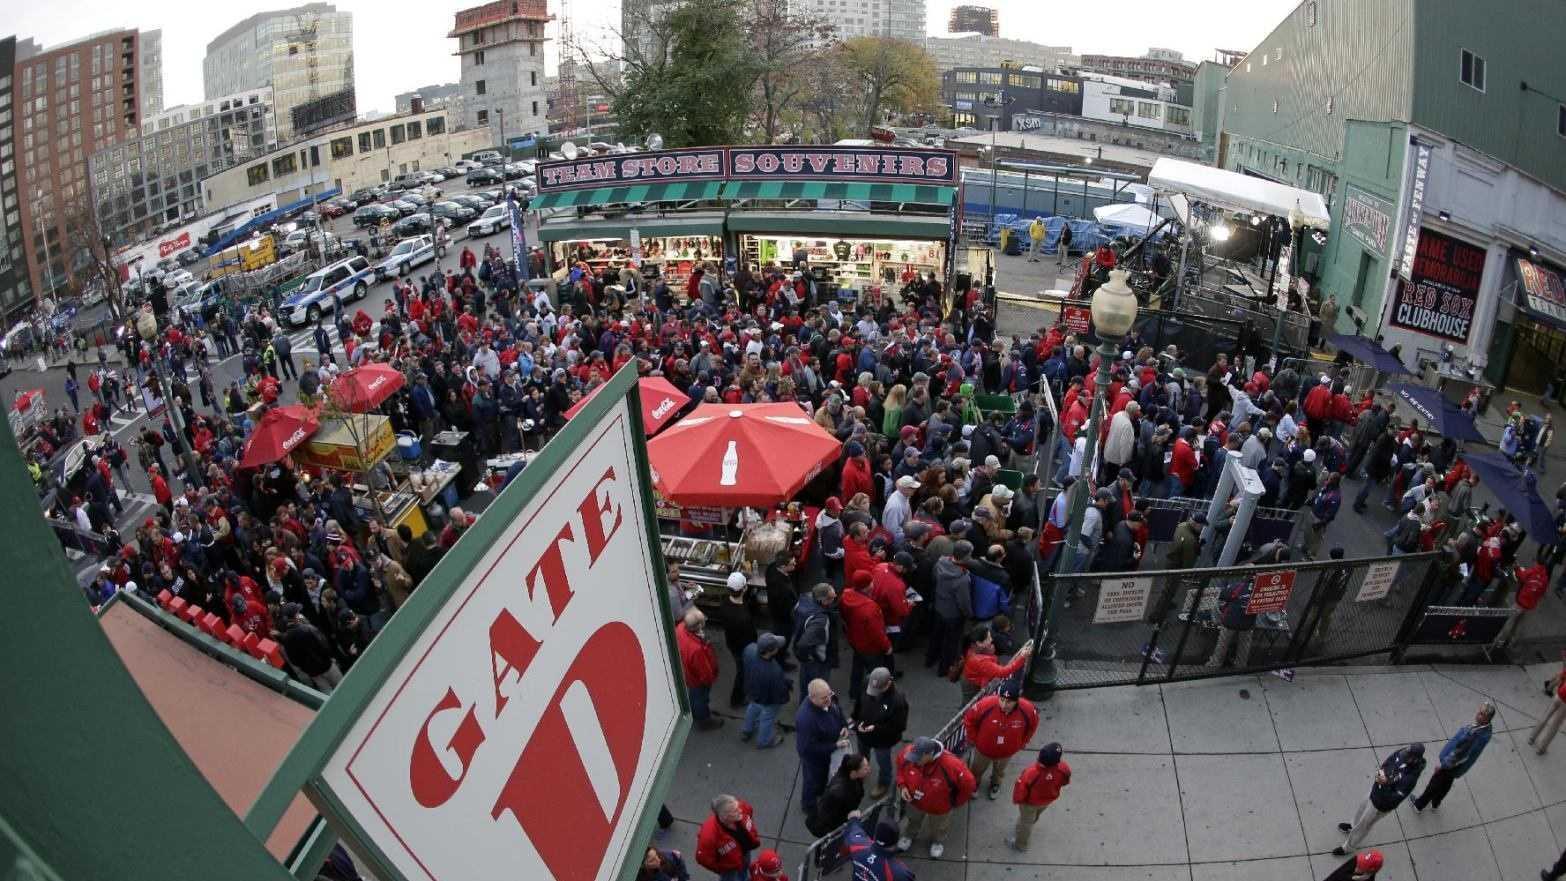 Red Sox Gate D Fenway Park 111513.jpg